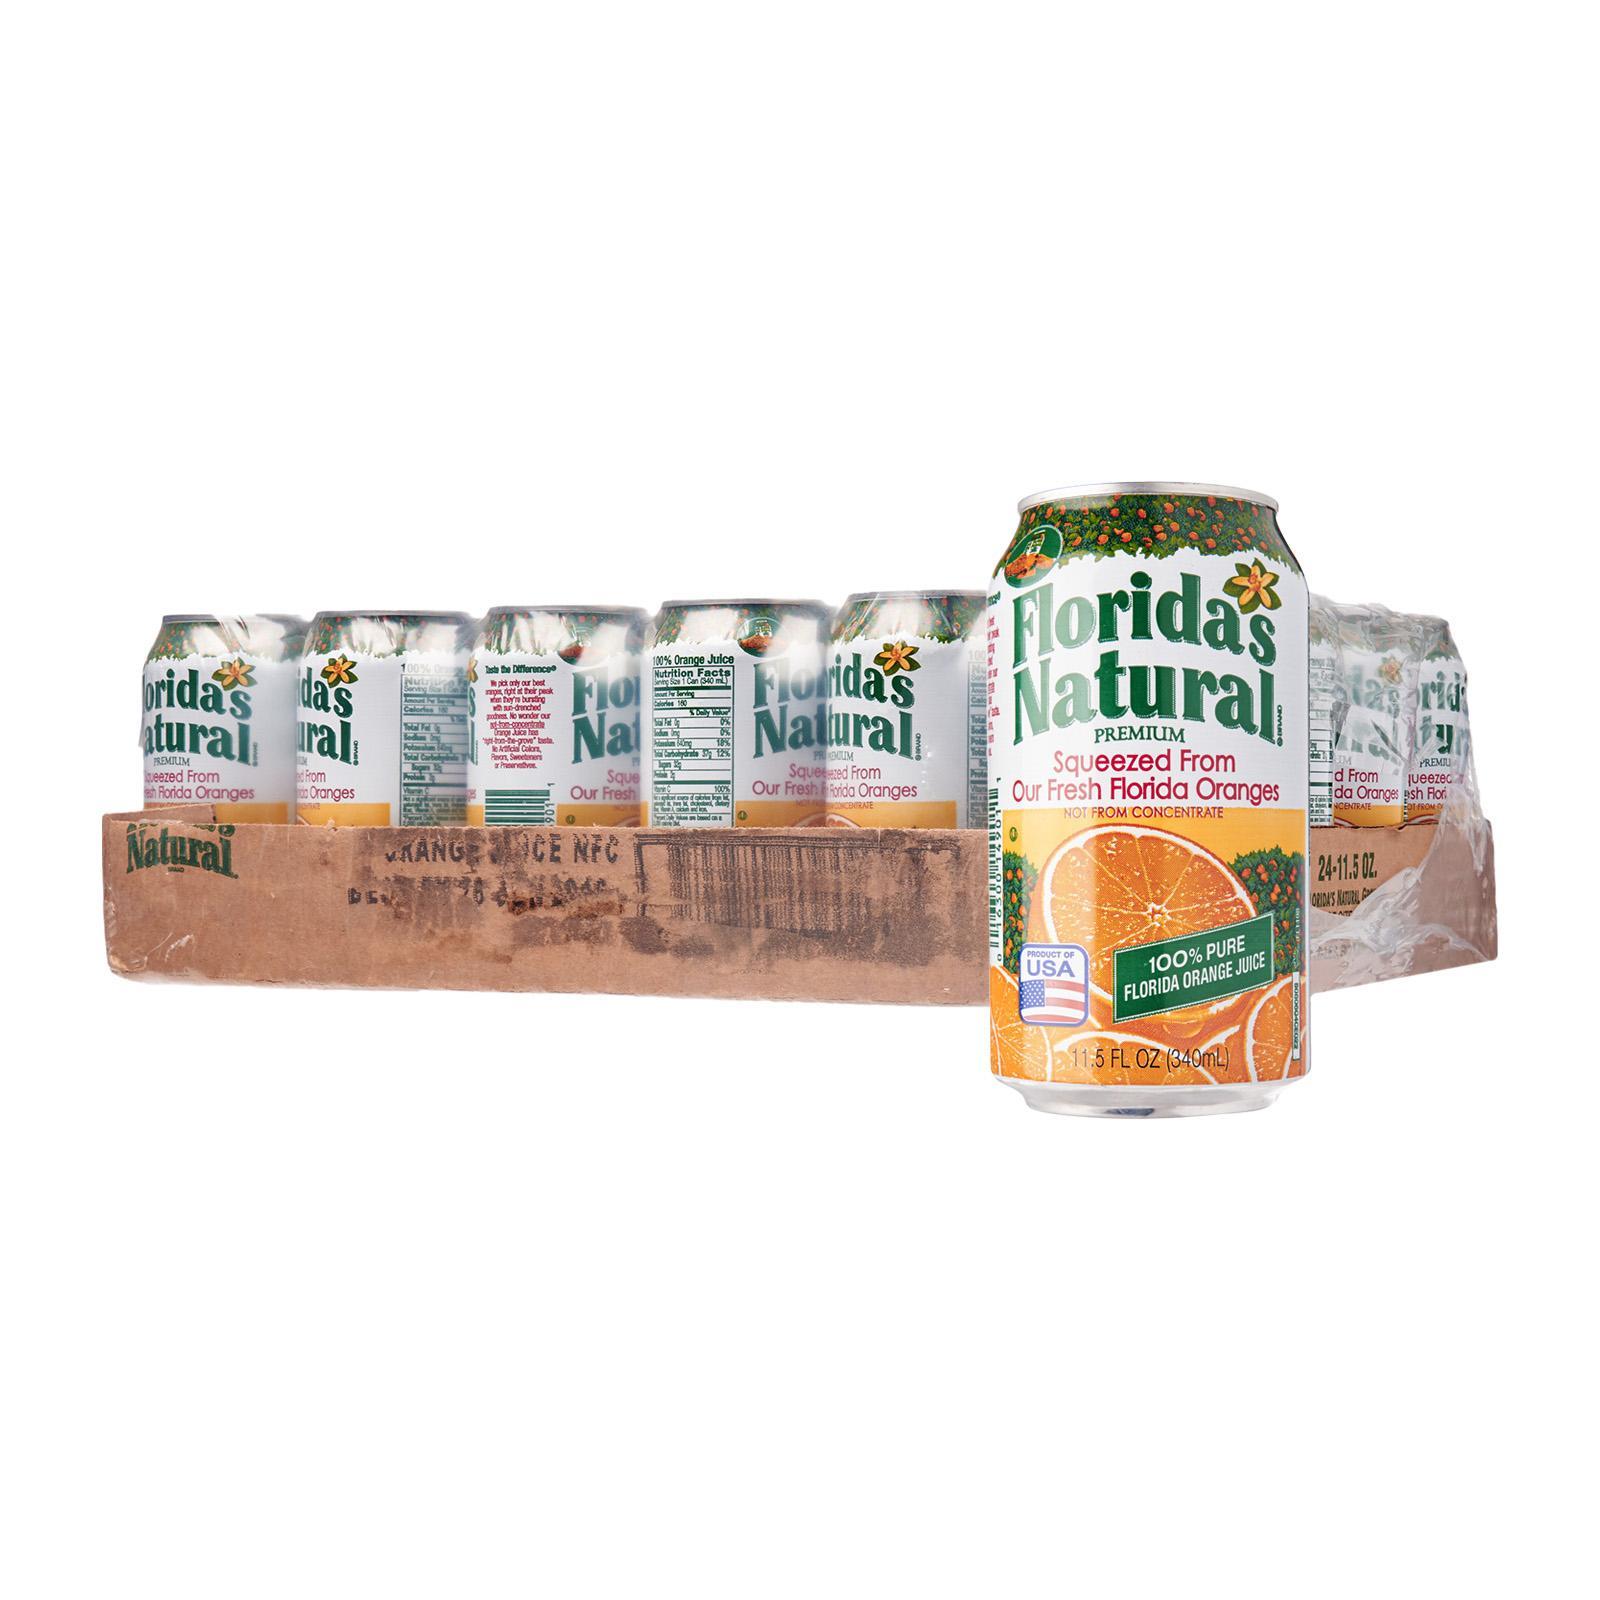 Florida's Natural Orange Juice - Case